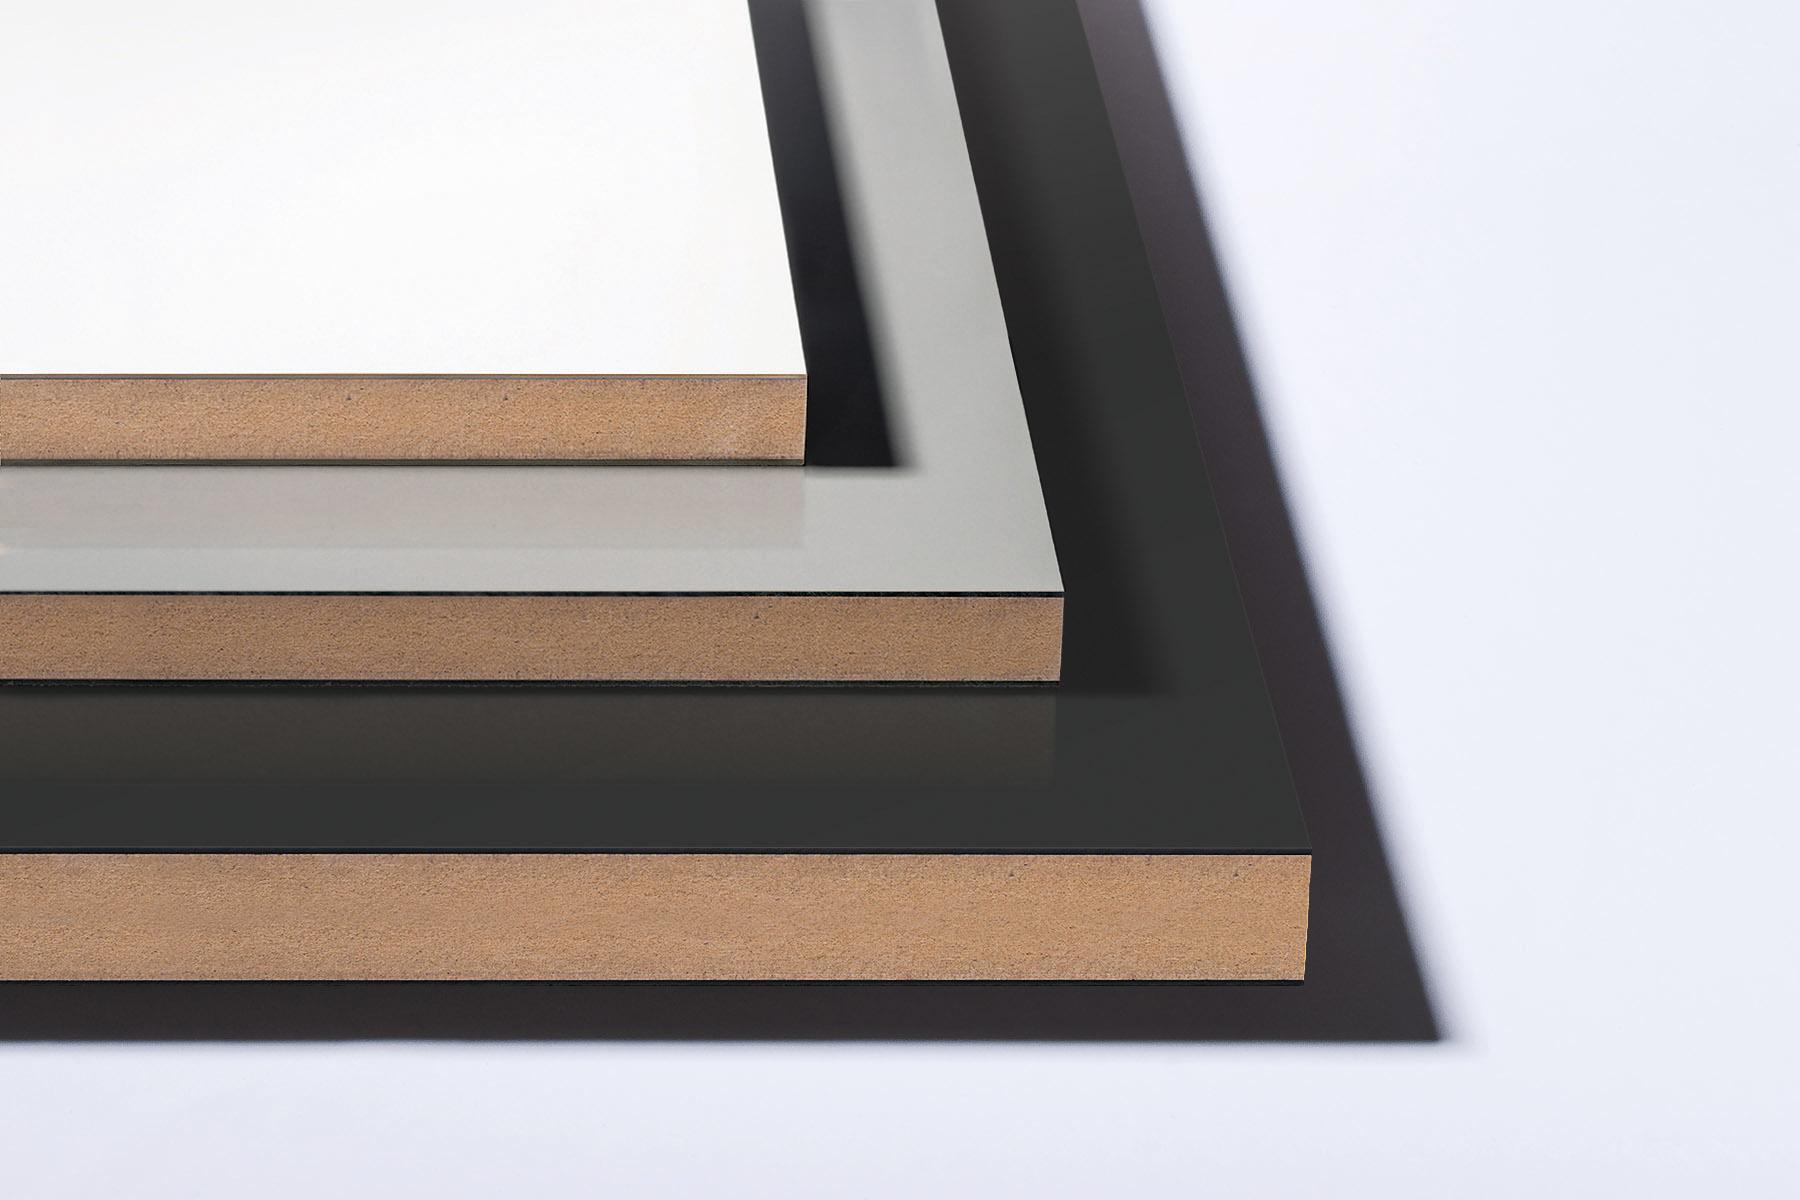 Mirror Gloss MDF - Mirror Gloss MDF - Avant-garde - Kronodesign